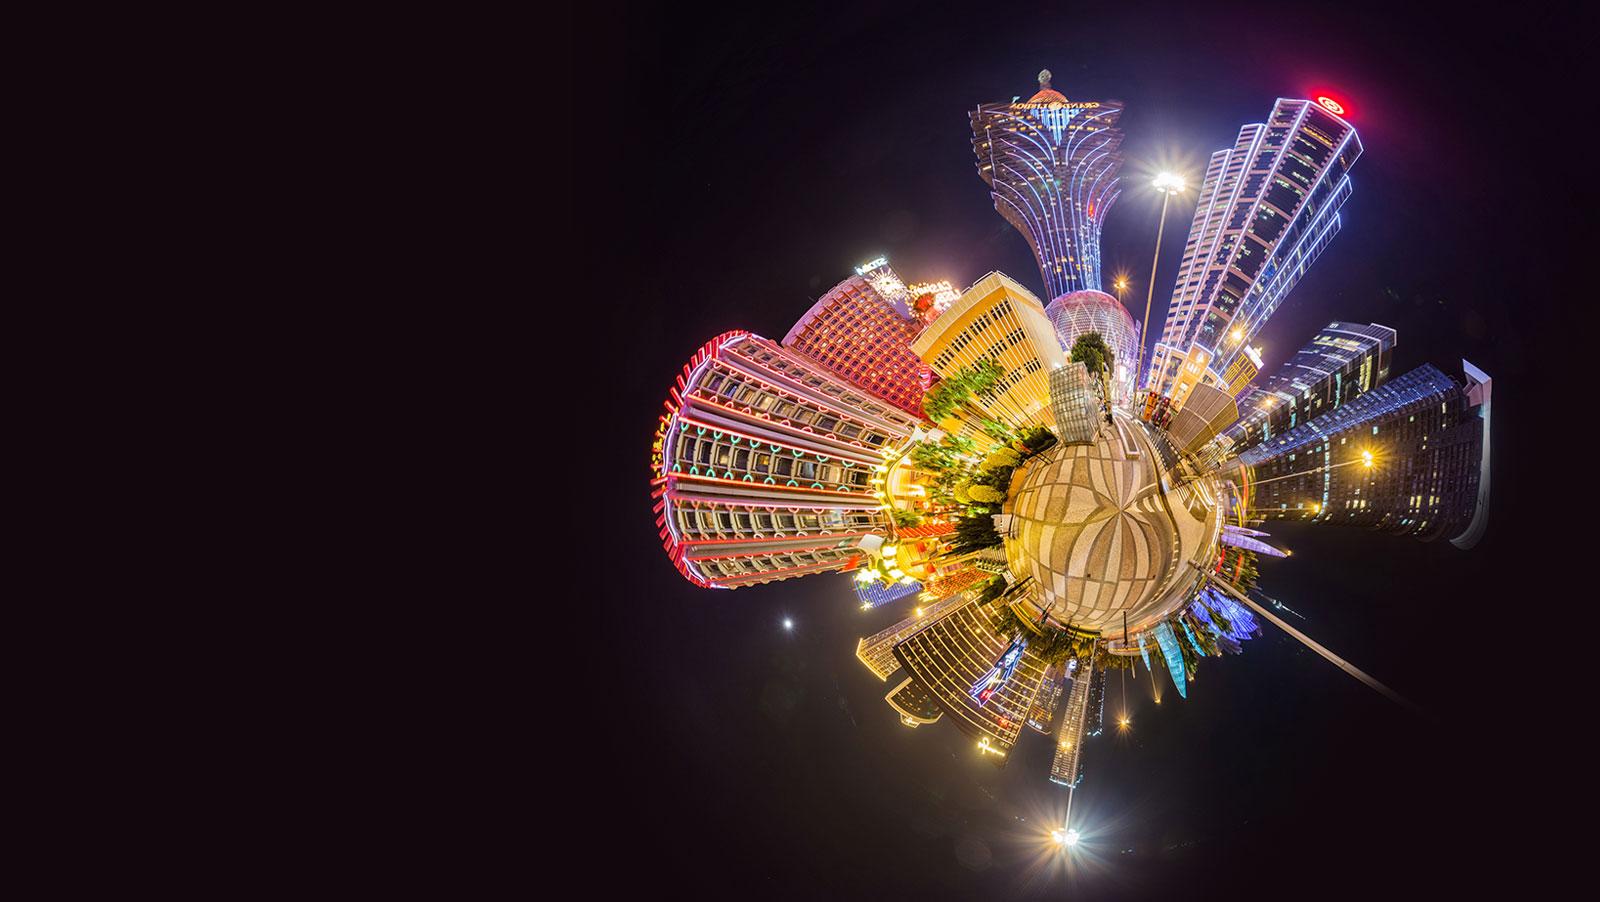 Macau extends gaming revenue growth streak to 21 months